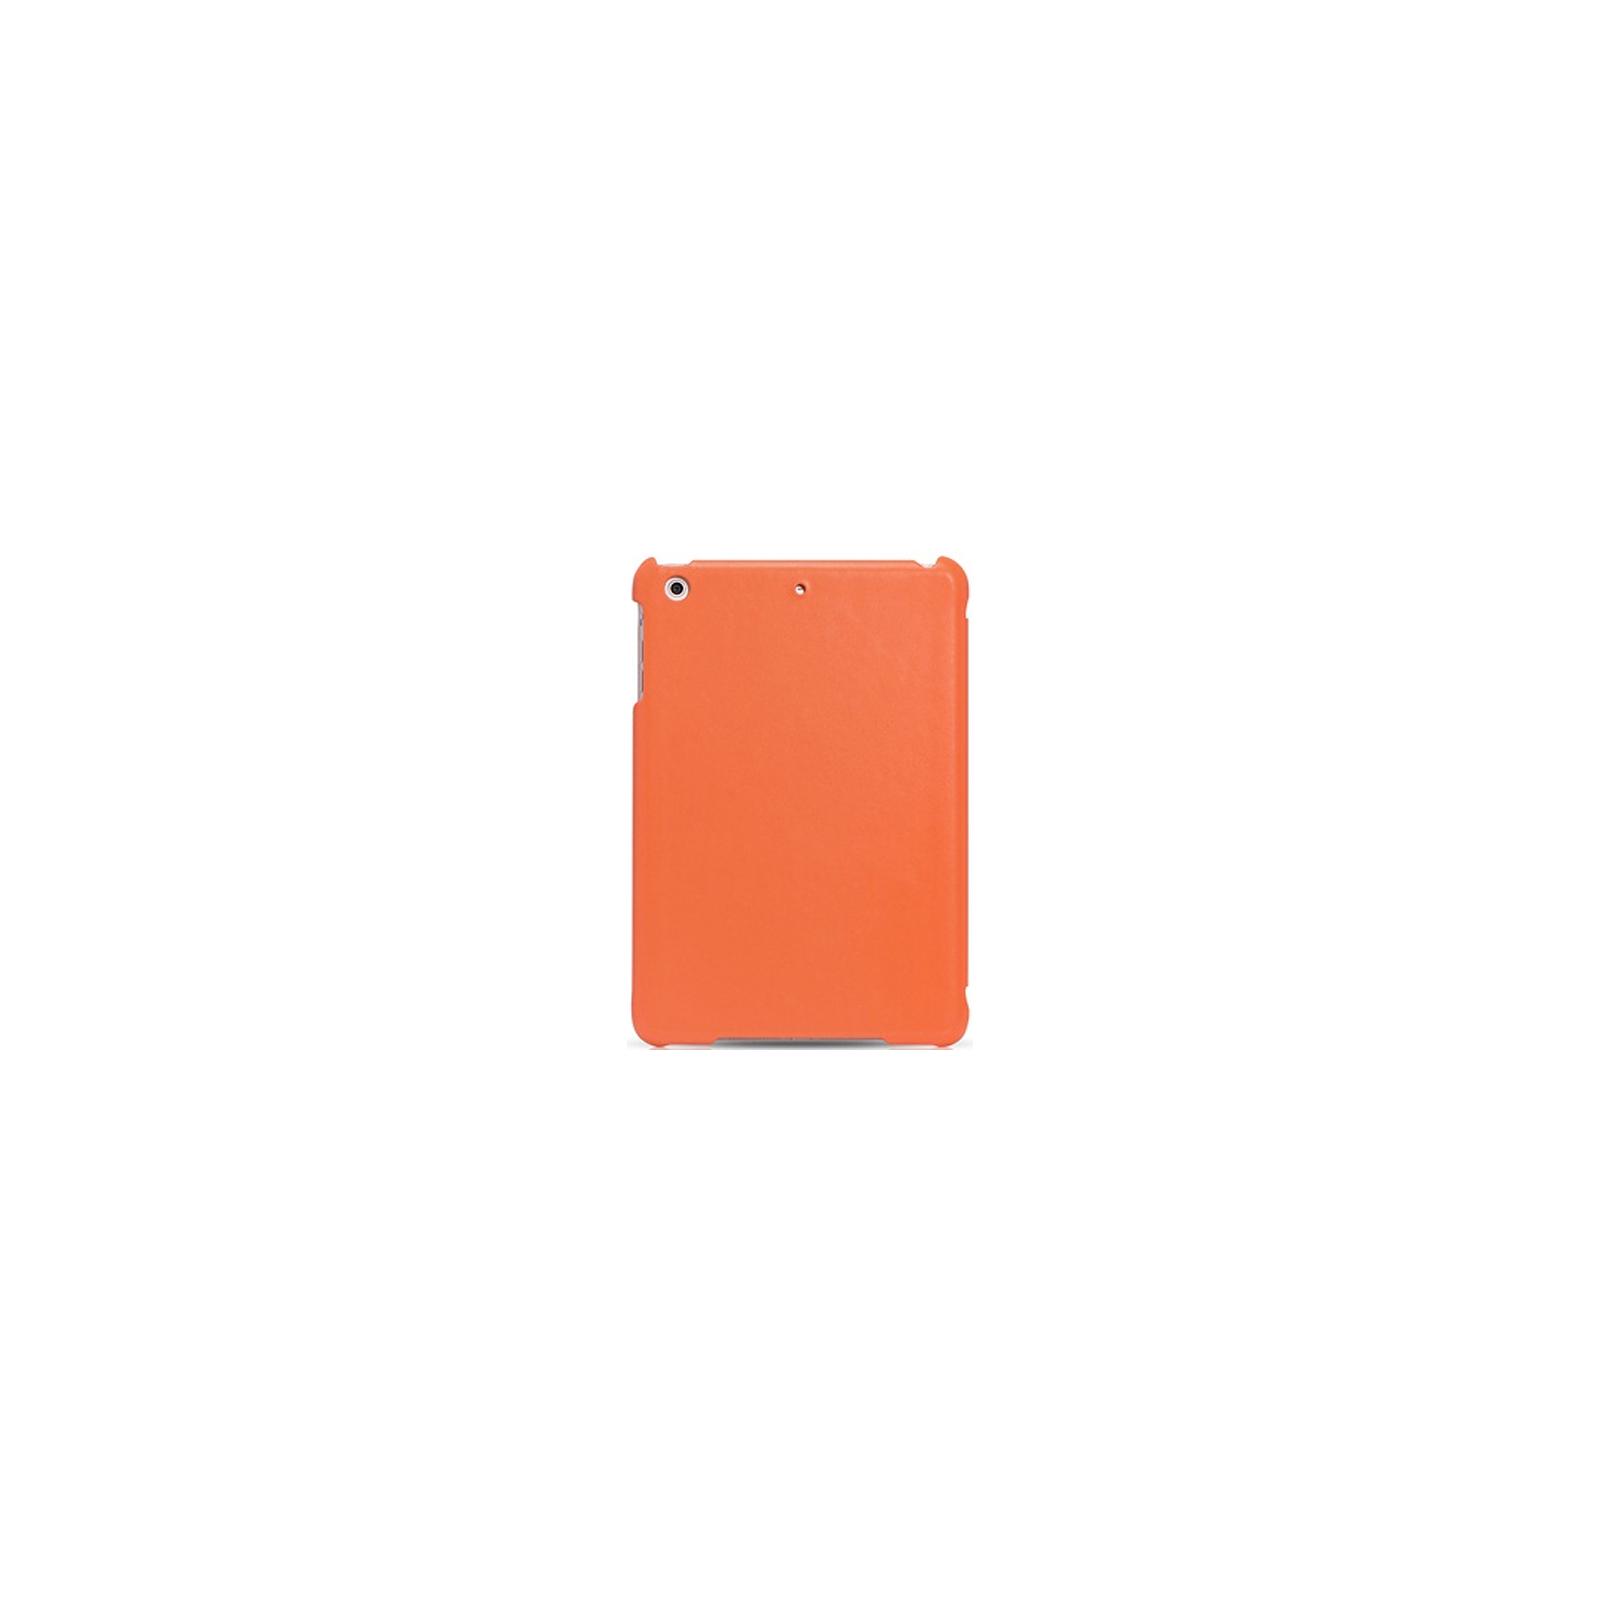 Чехол для планшета i-Carer iPad Mini Retina Ultra thin genuine leather series orange (RID794or) изображение 2